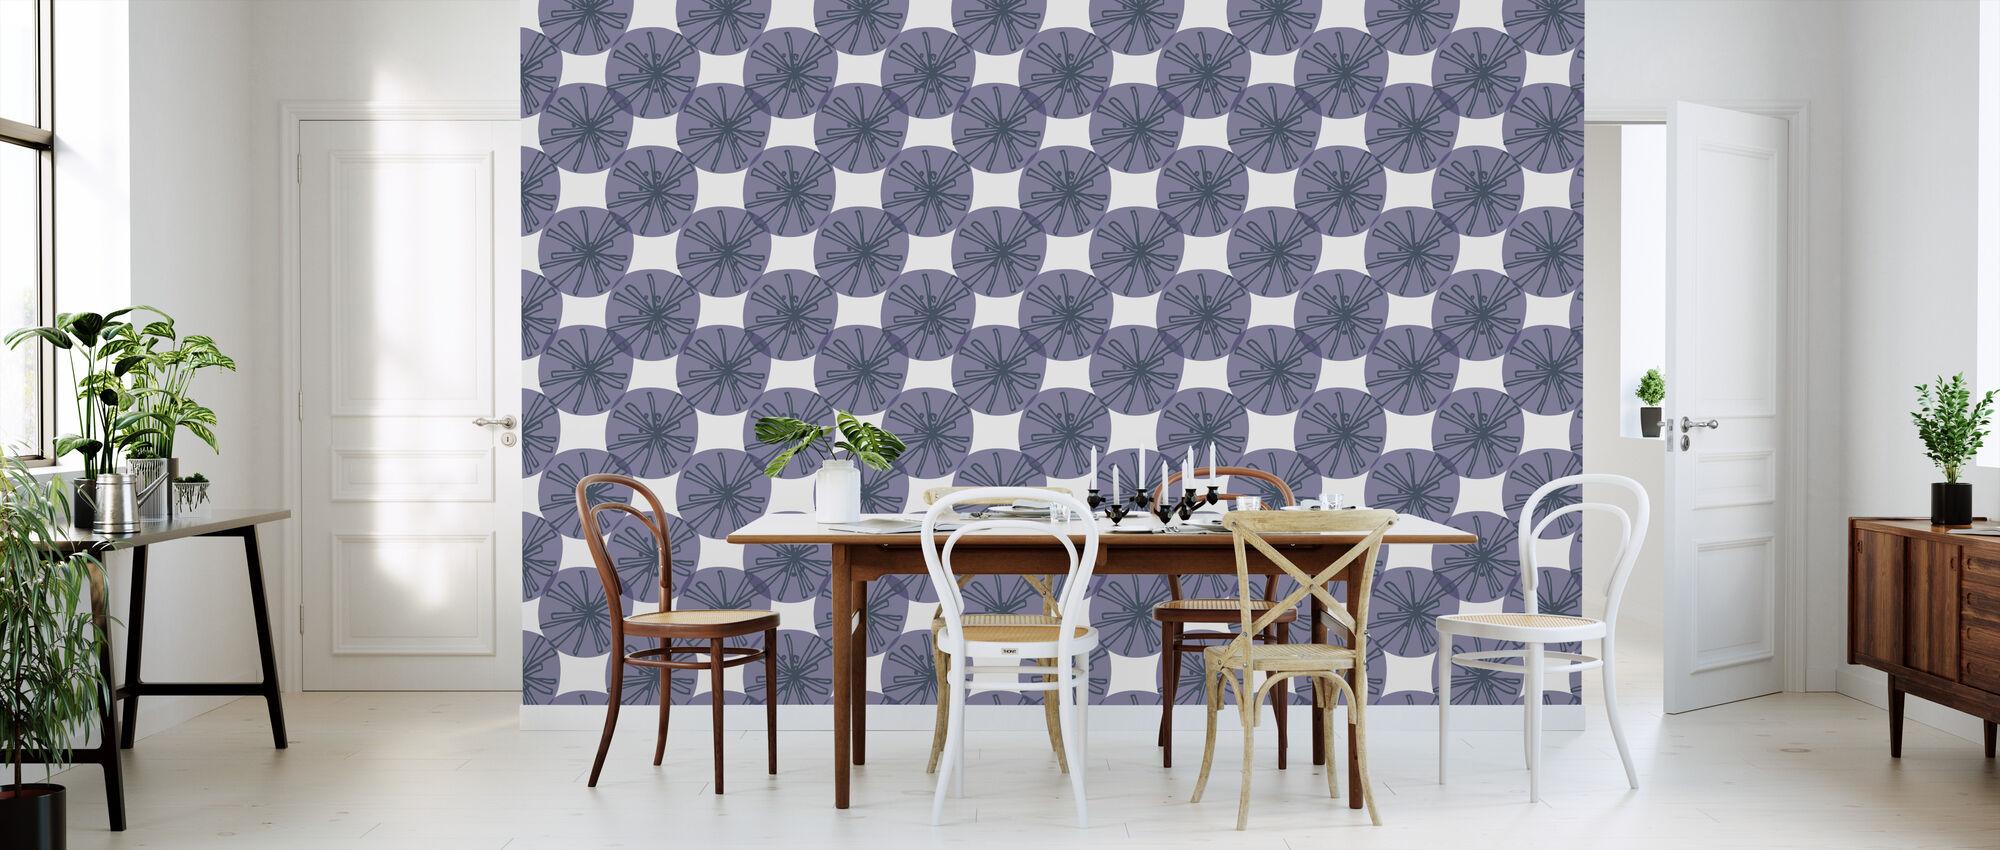 Dandelion - Purpleblue - Wallpaper - Kitchen